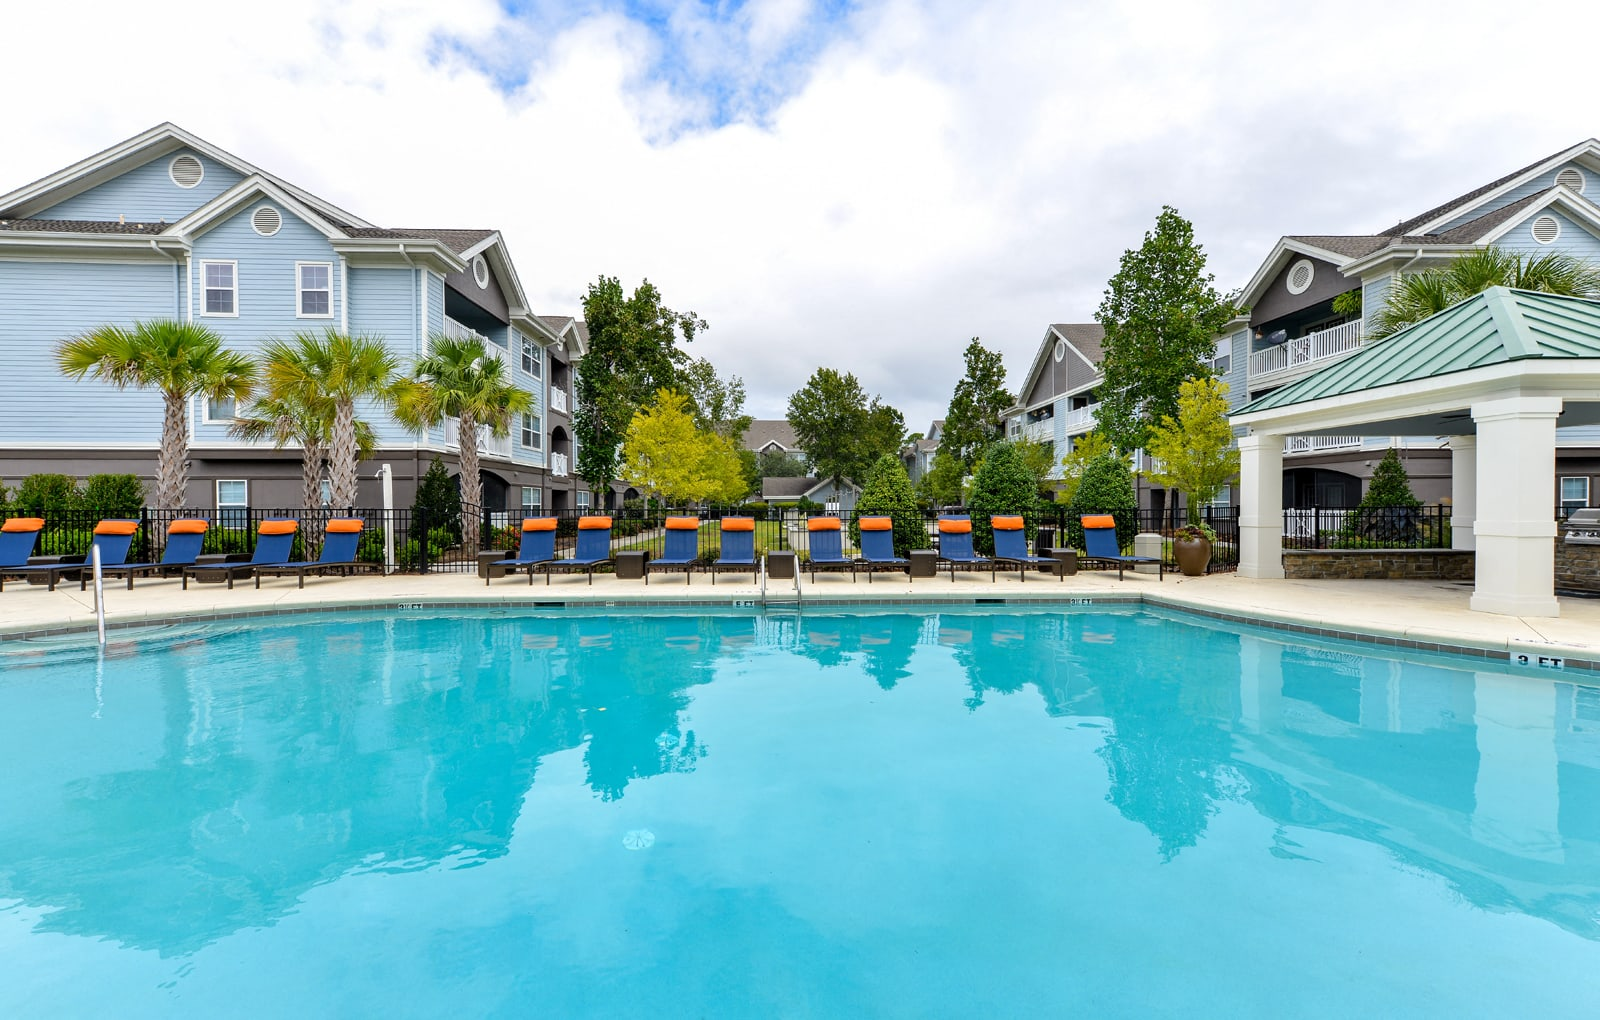 The Bluestone swimming pool